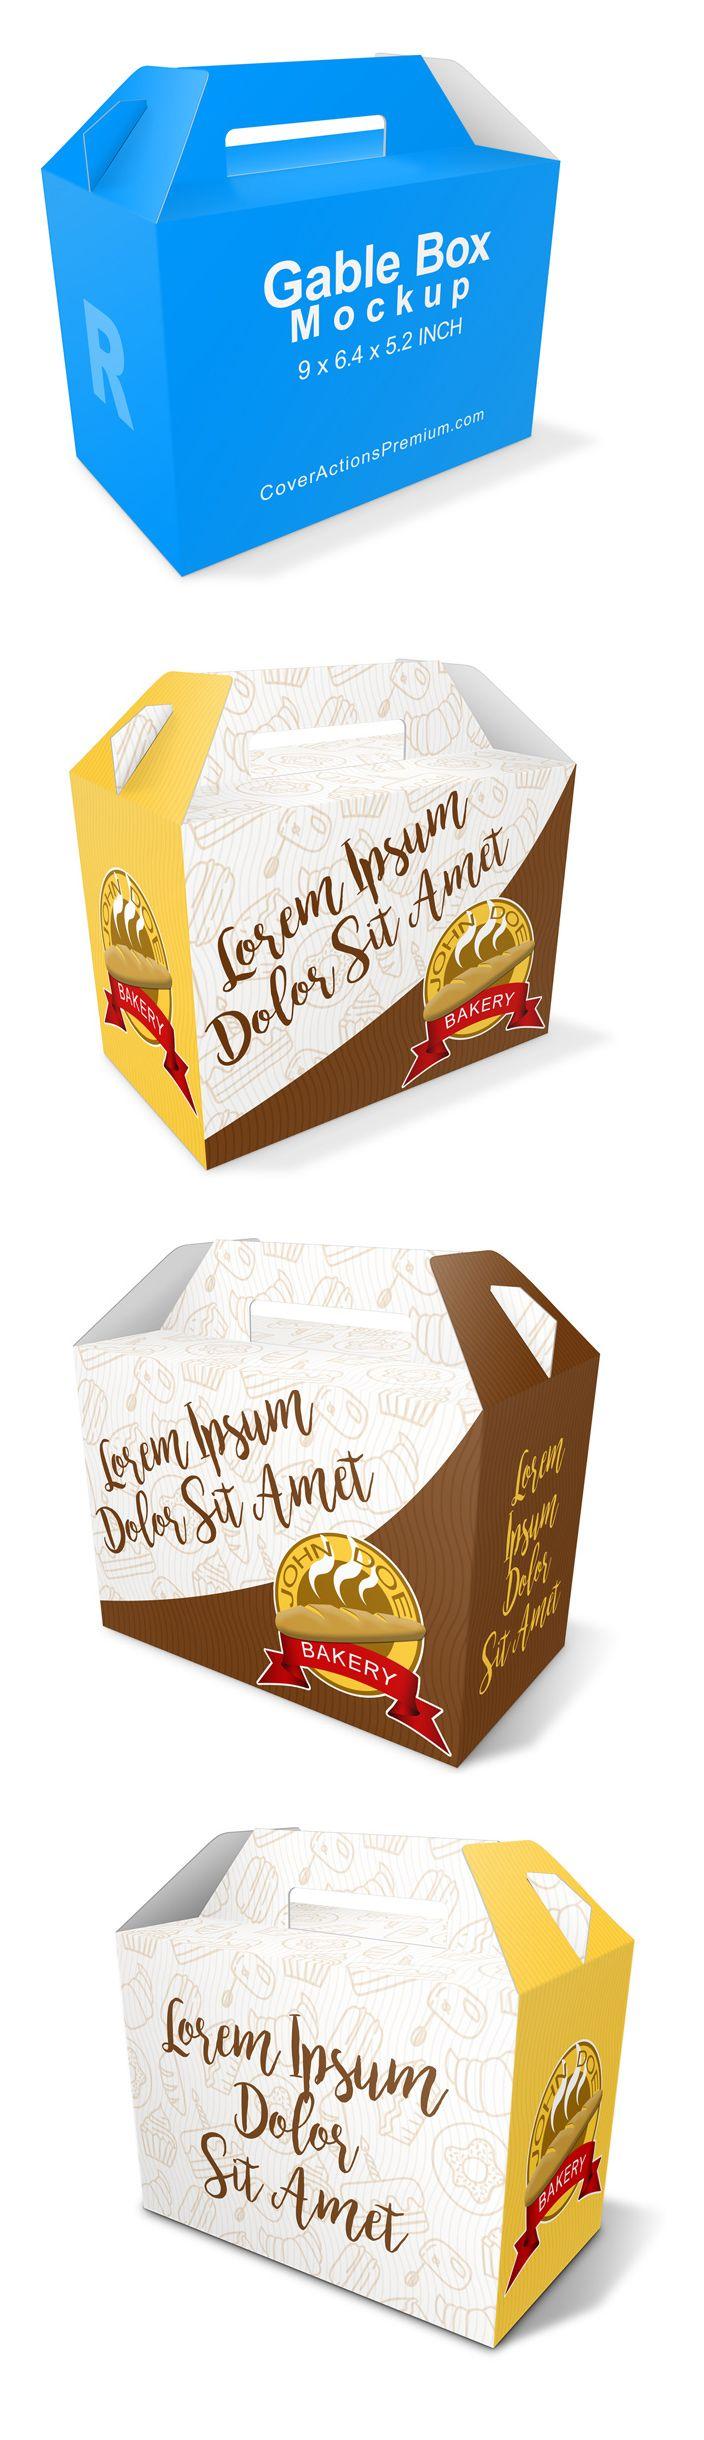 Download Gable Box Mockup V1 Cover Actions Premium Mockup Psd Template Box Mockup Gable Boxes Box